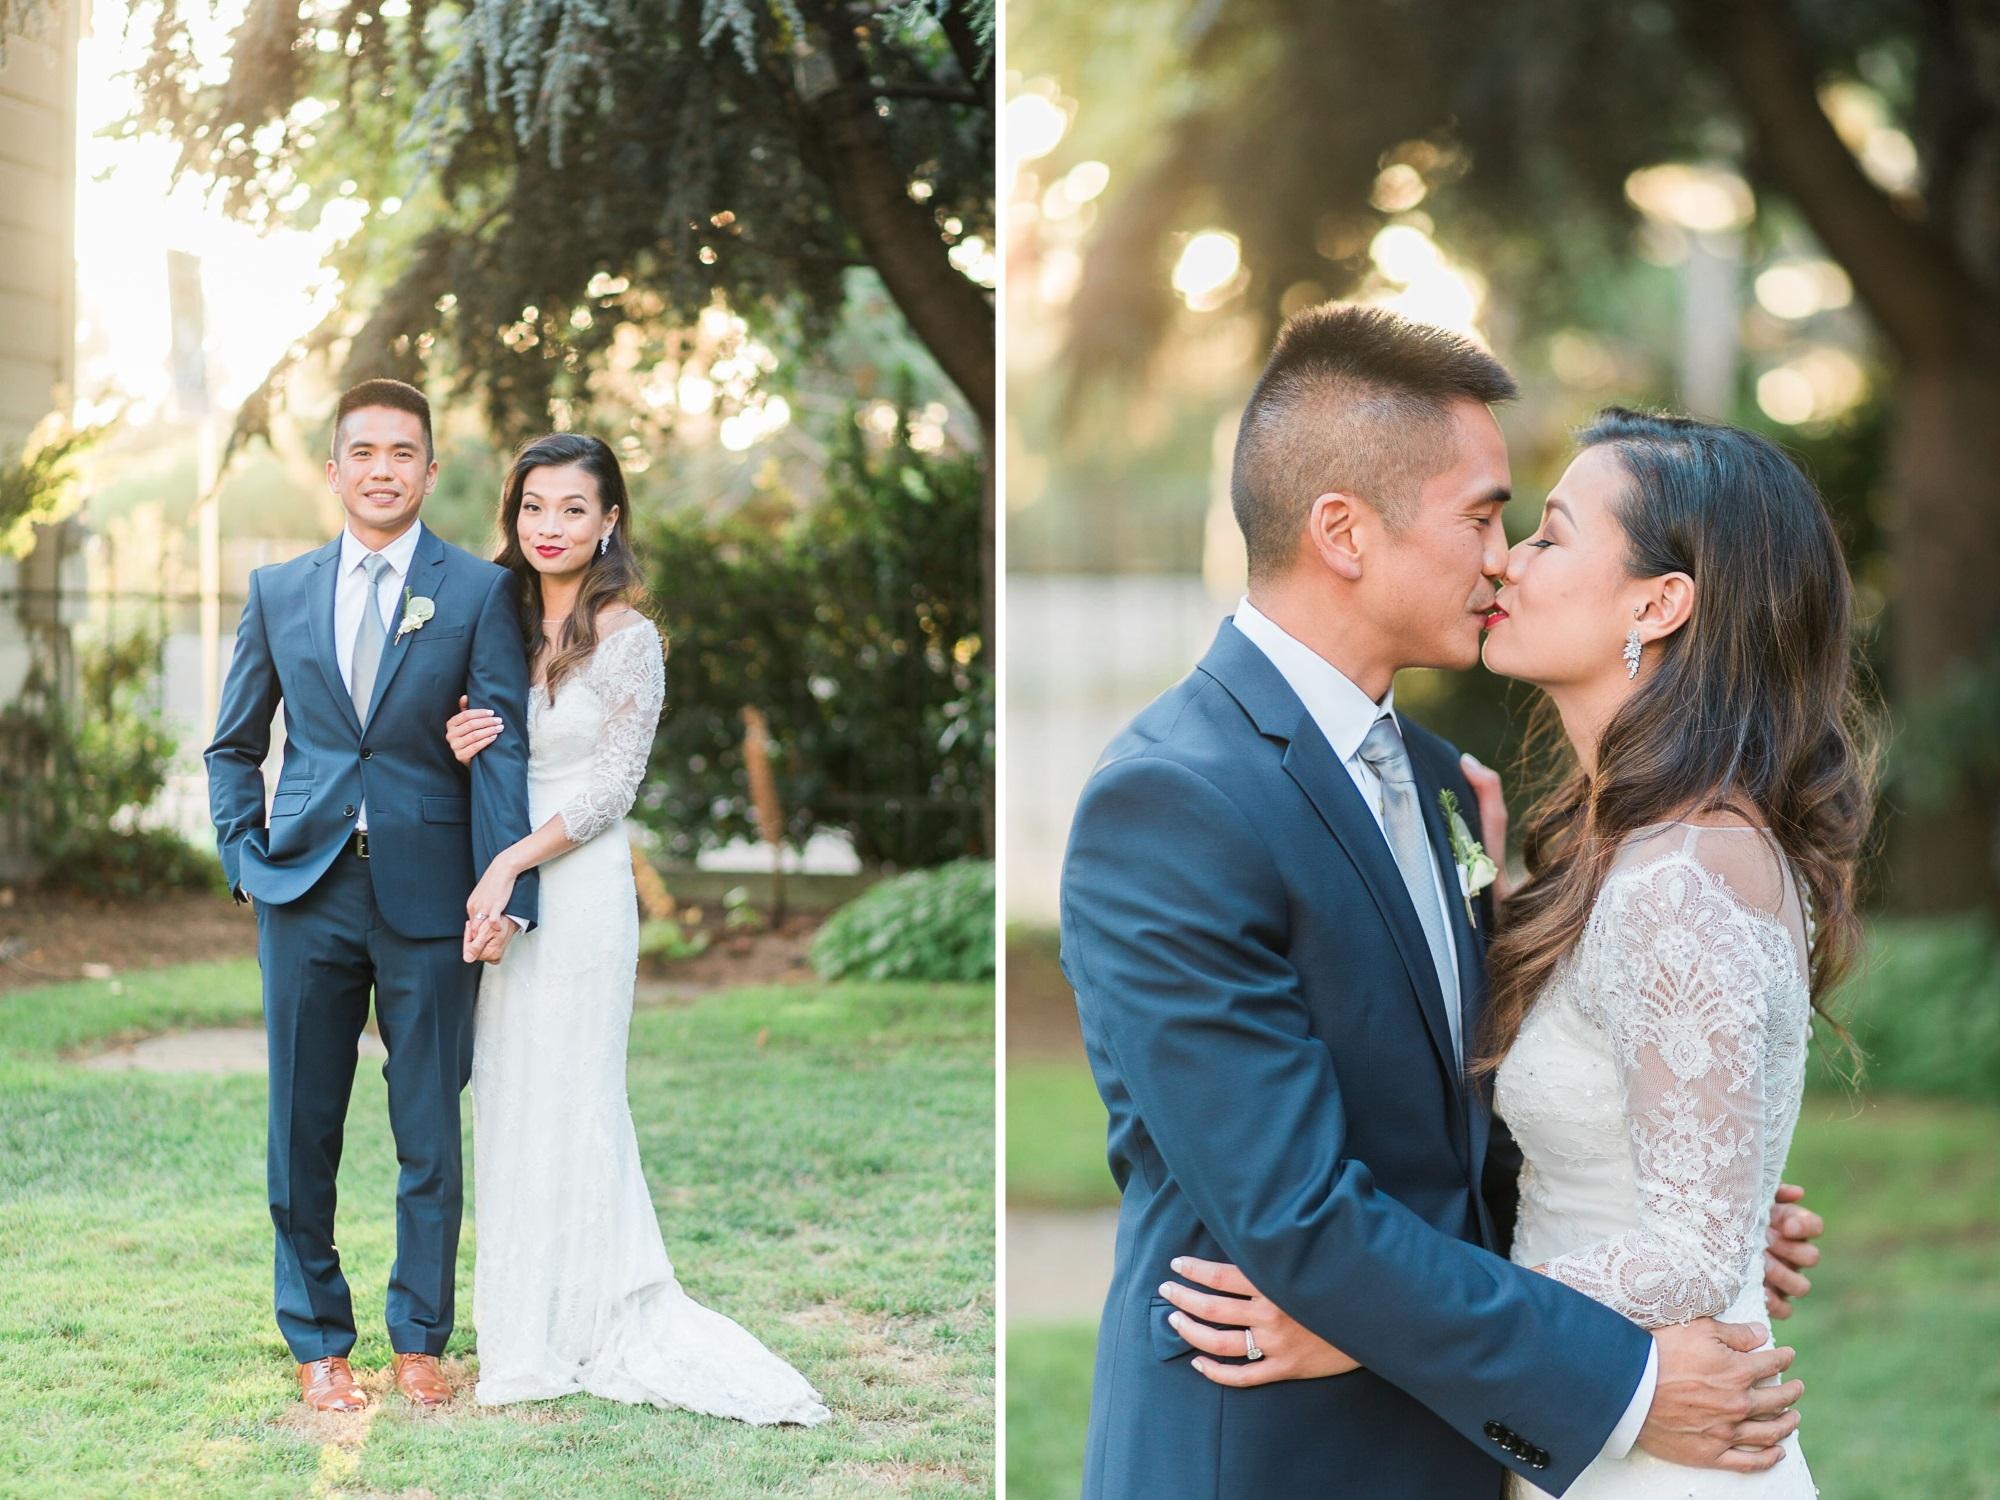 Wedding at Preservation Park in Oakland - Preservation Park Wedding Photos by JBJ Pictures San Francisco Photographer (55).jpg